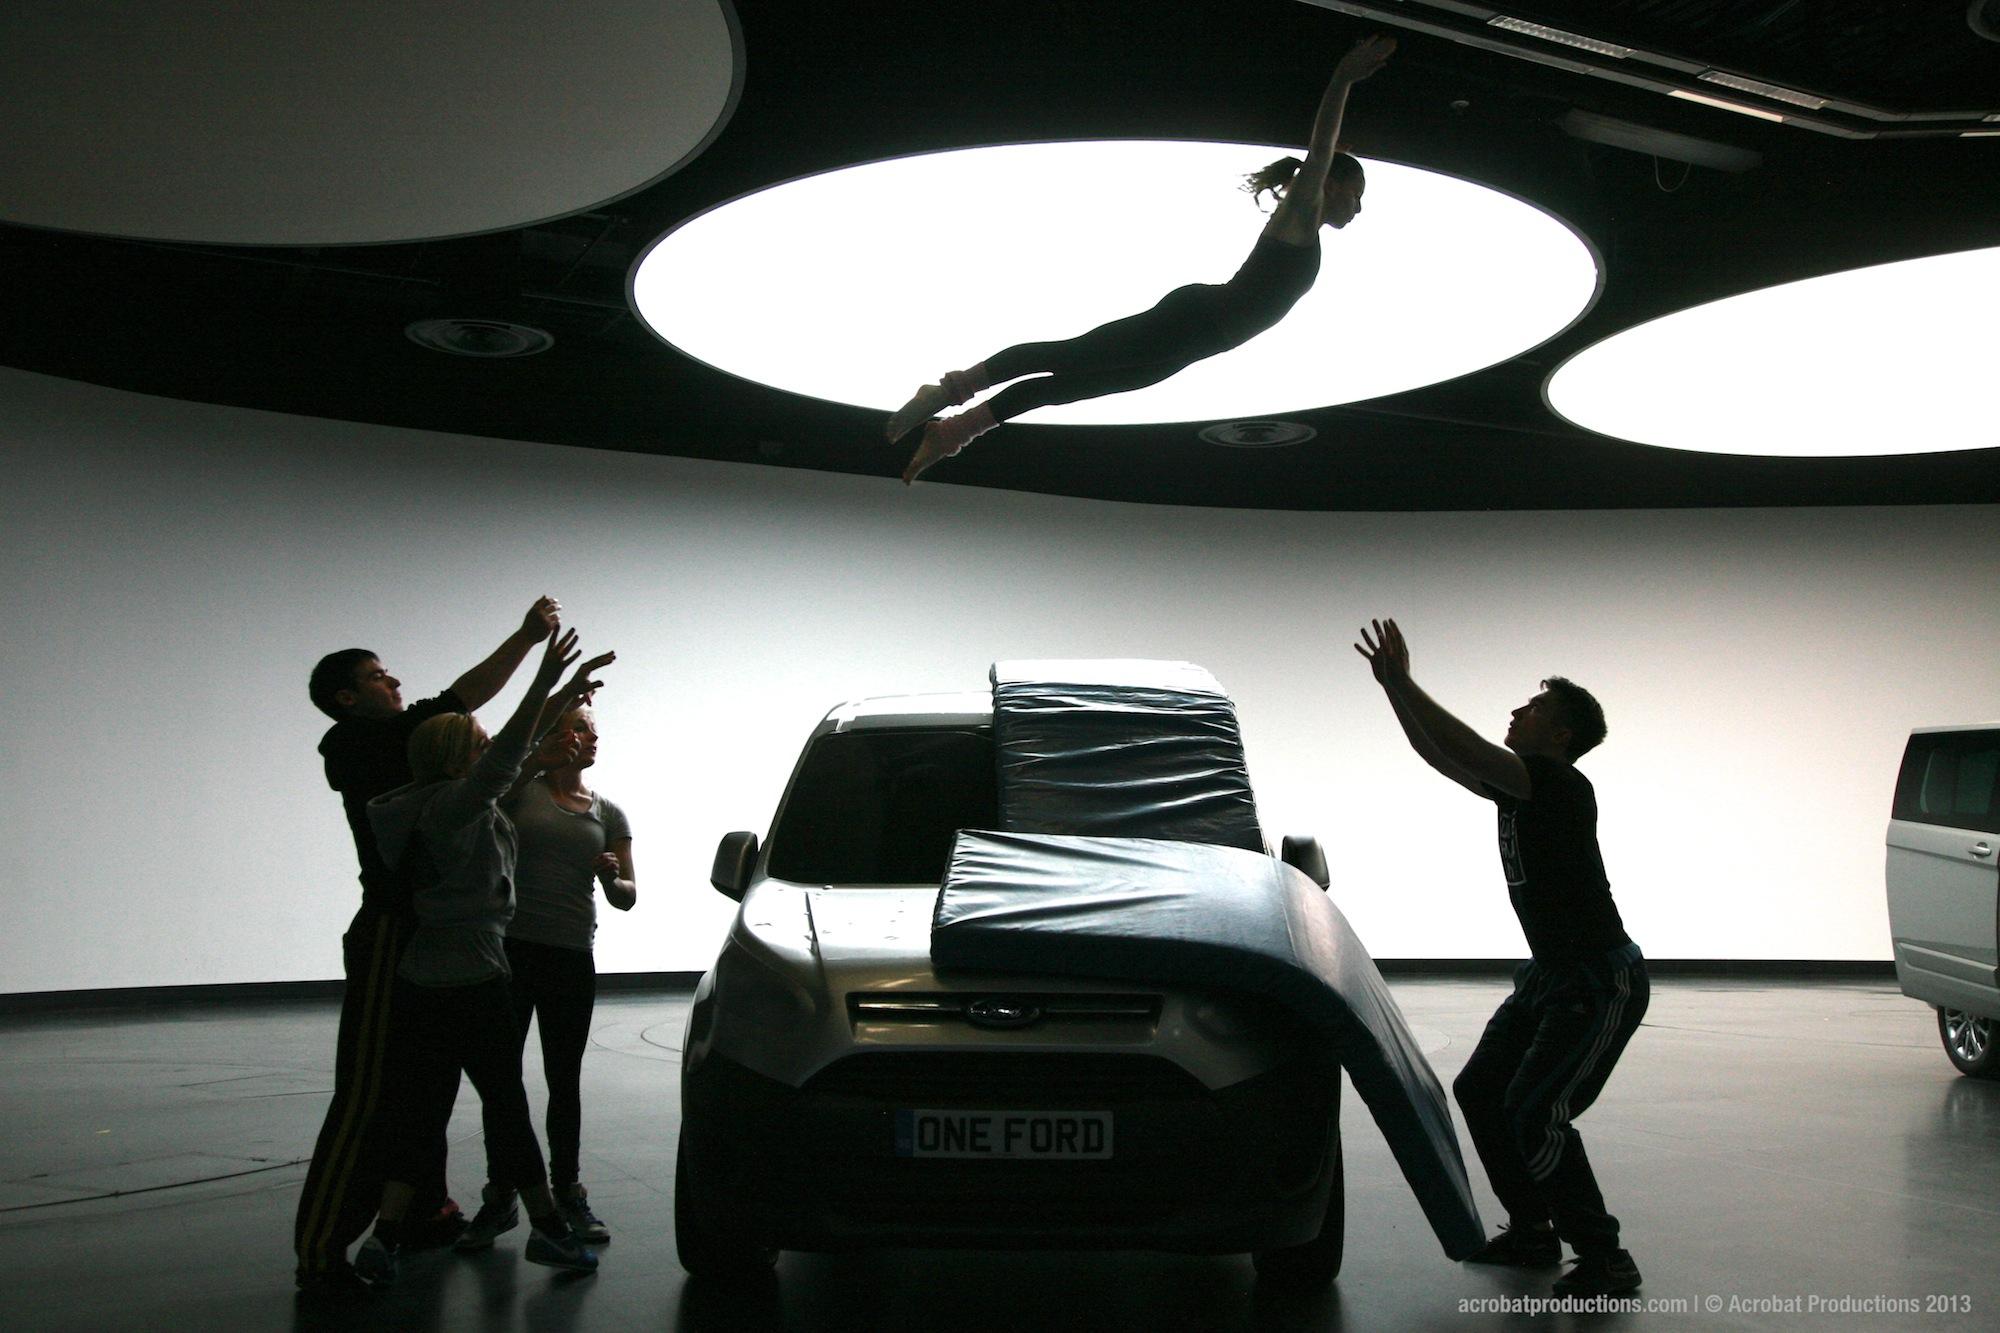 Acrobat Productions at Geneva Motor Show